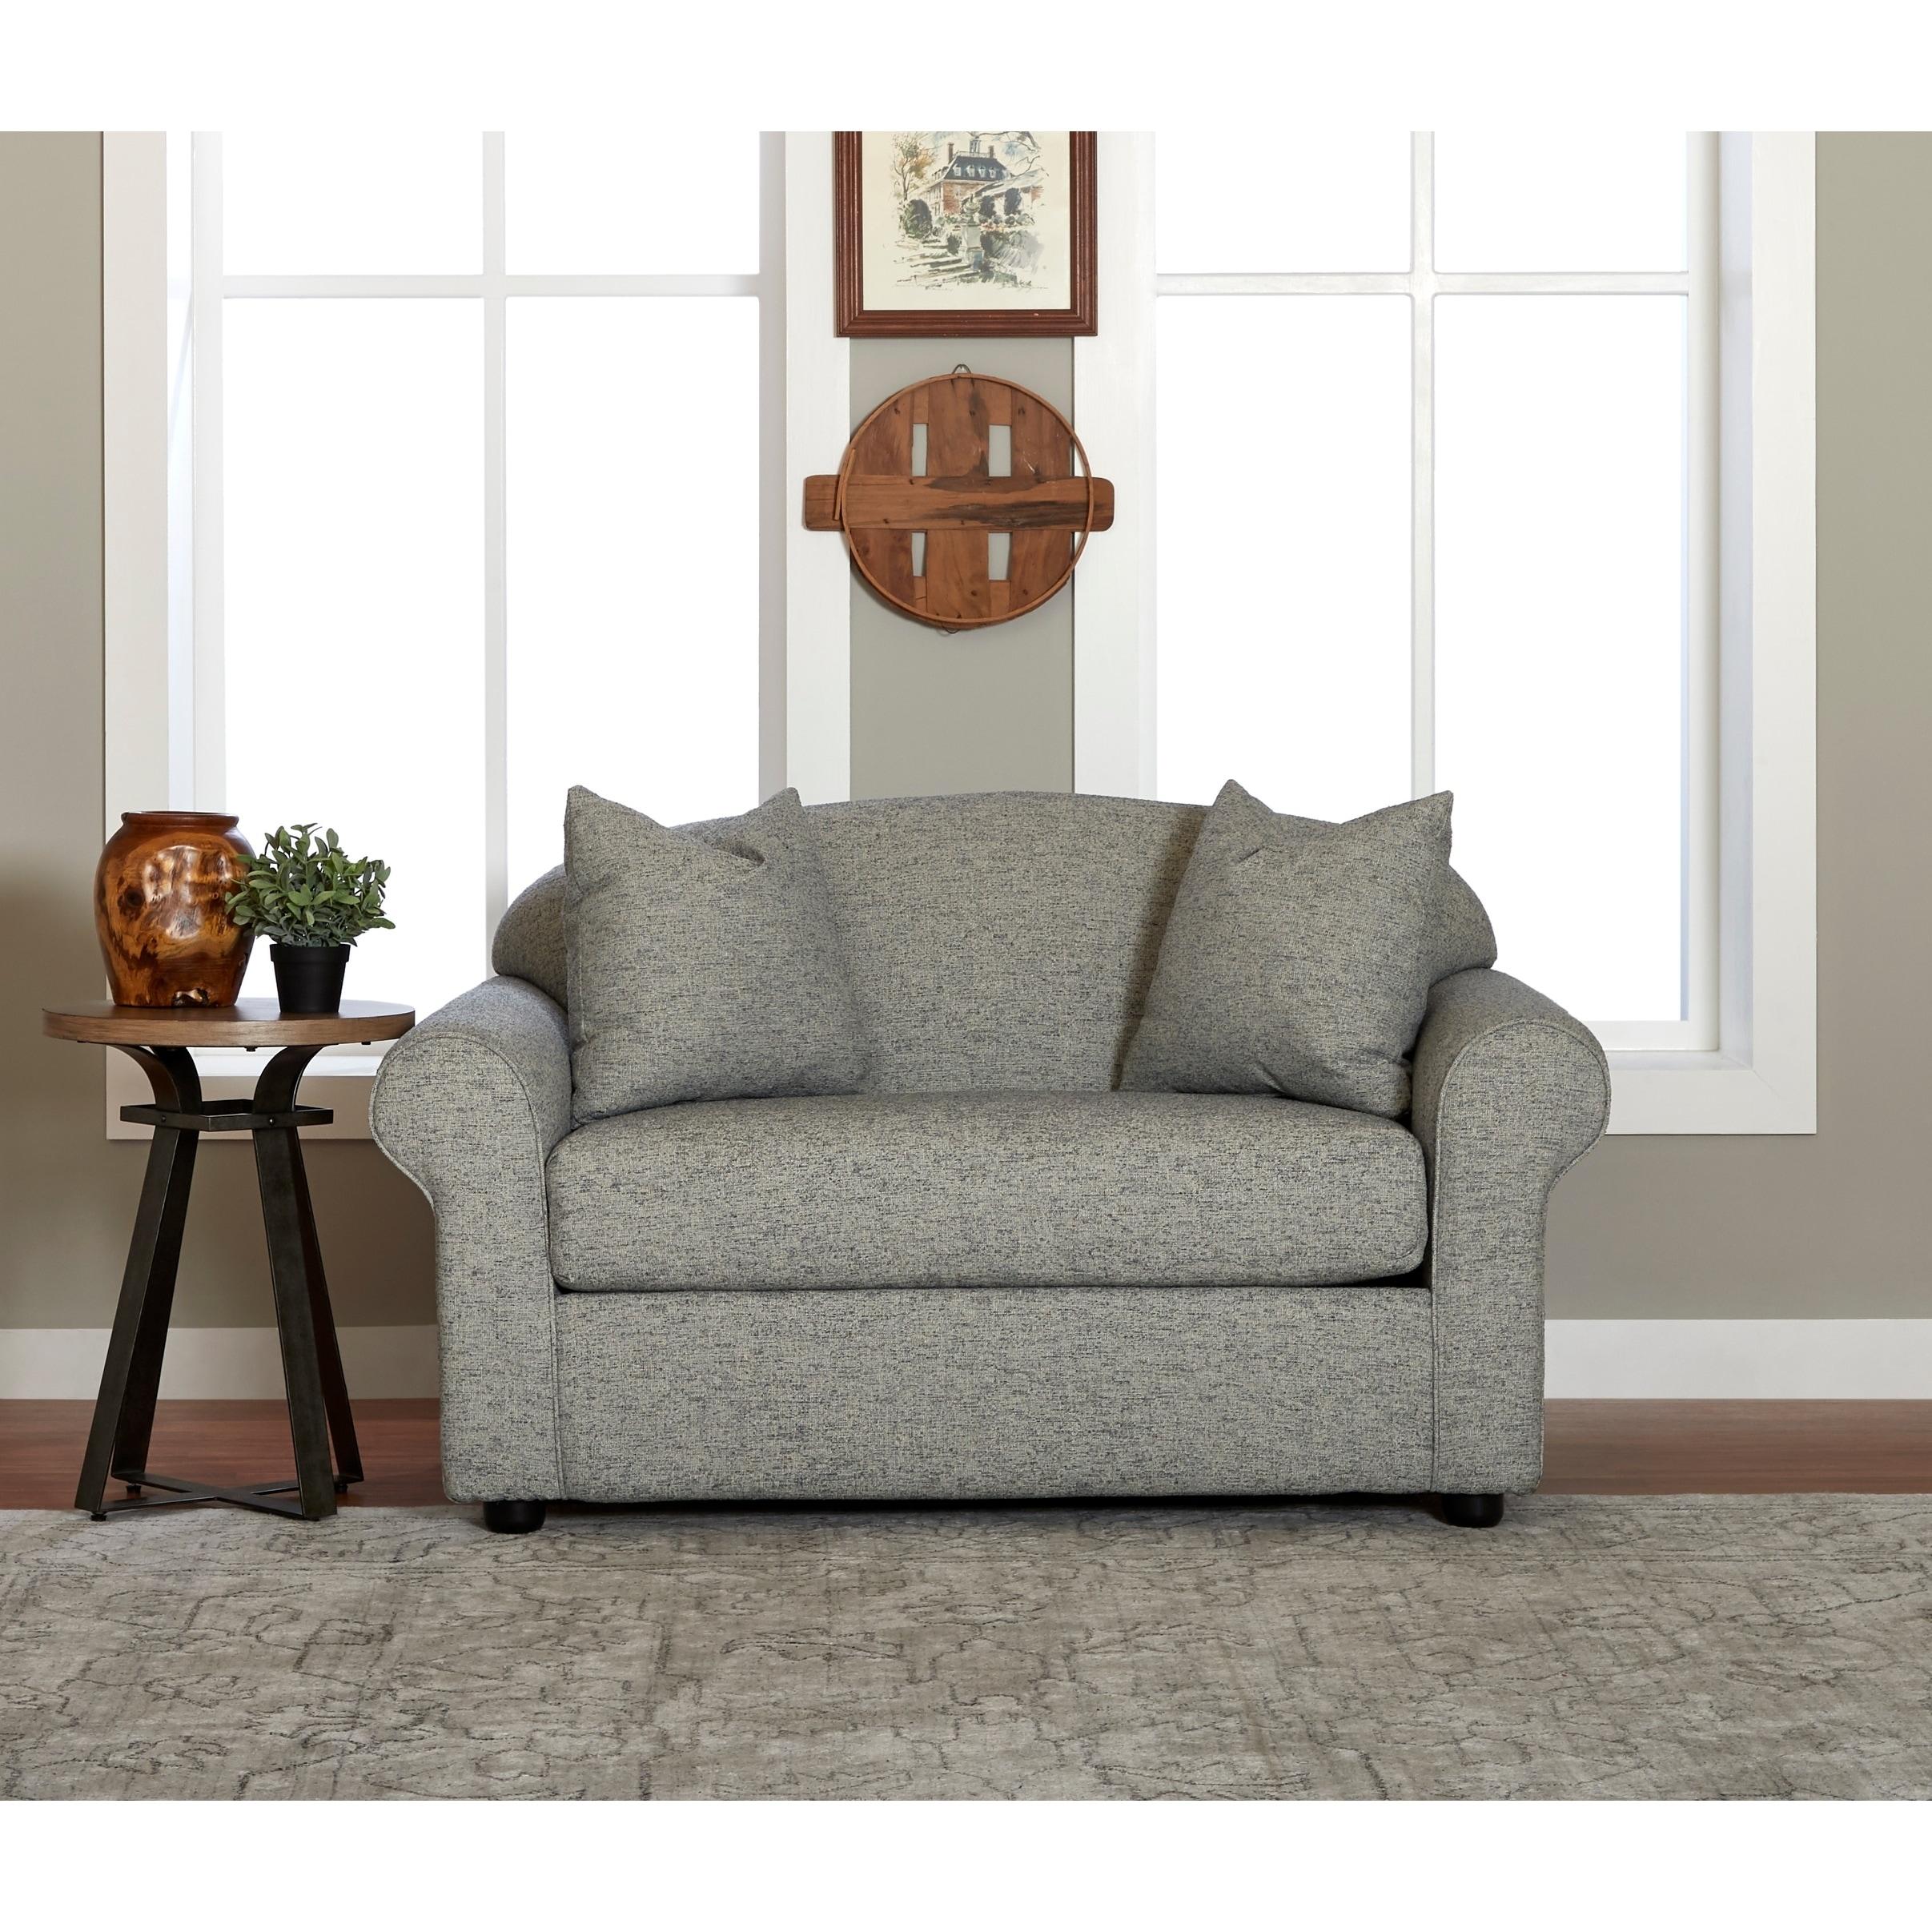 Superb Sleepers Shop Online At Overstock Machost Co Dining Chair Design Ideas Machostcouk